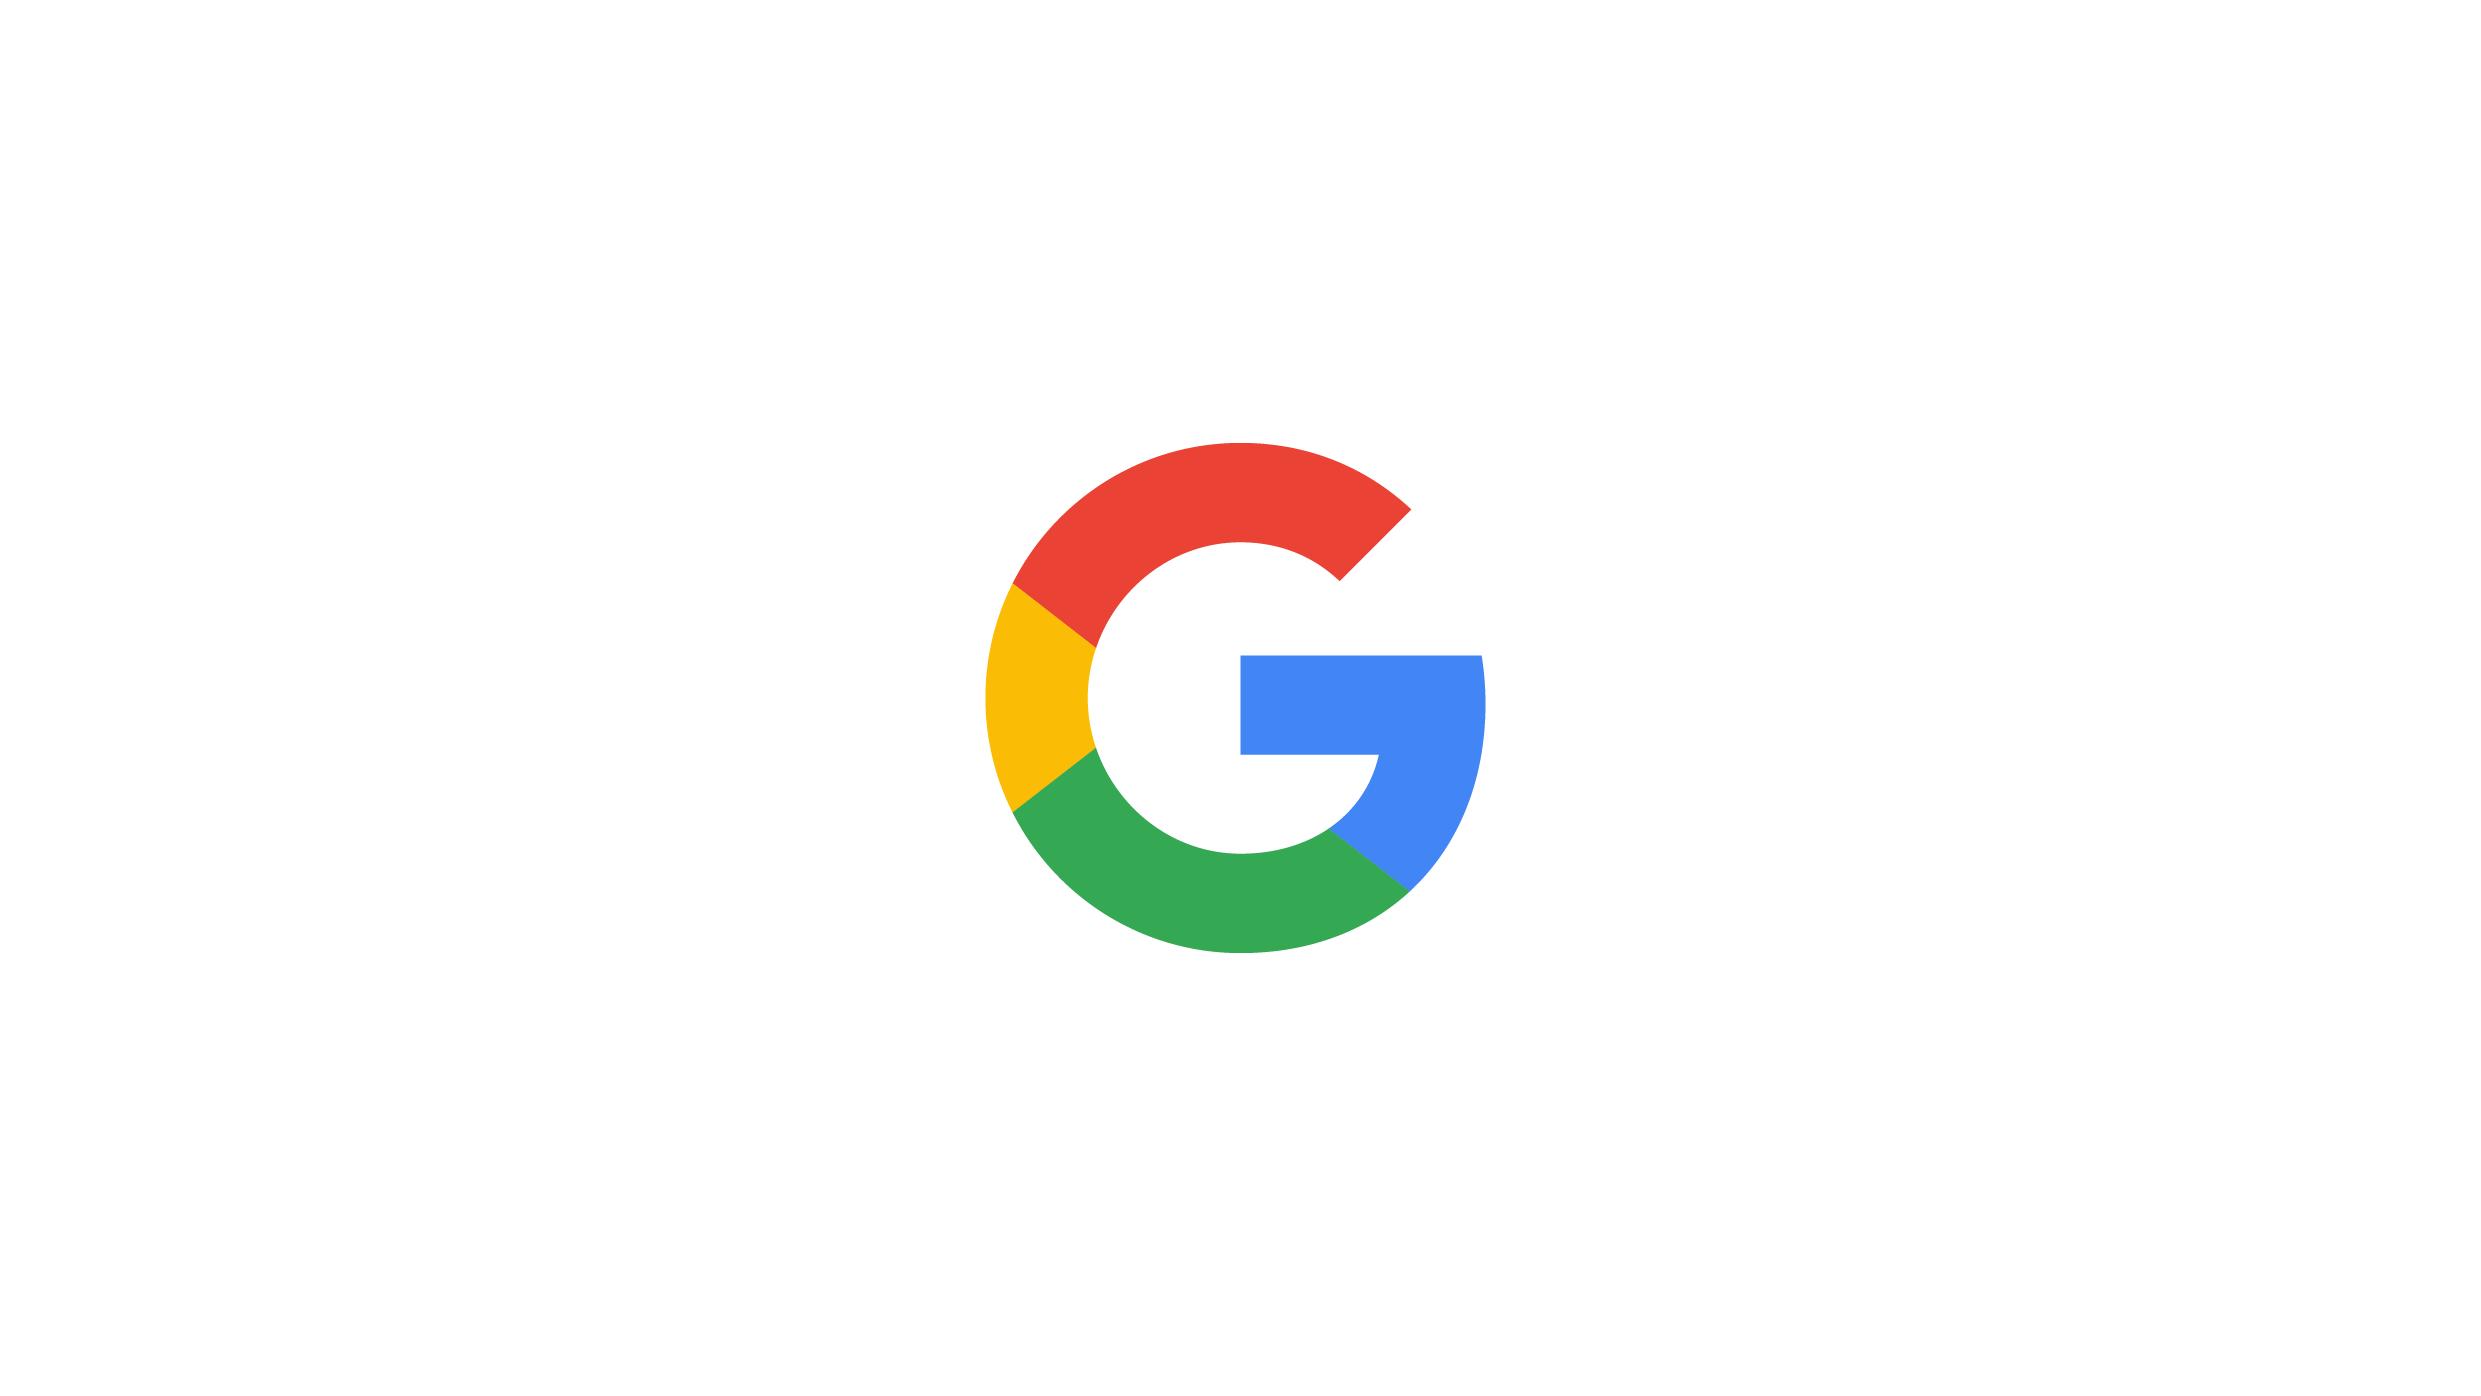 g-letter.png